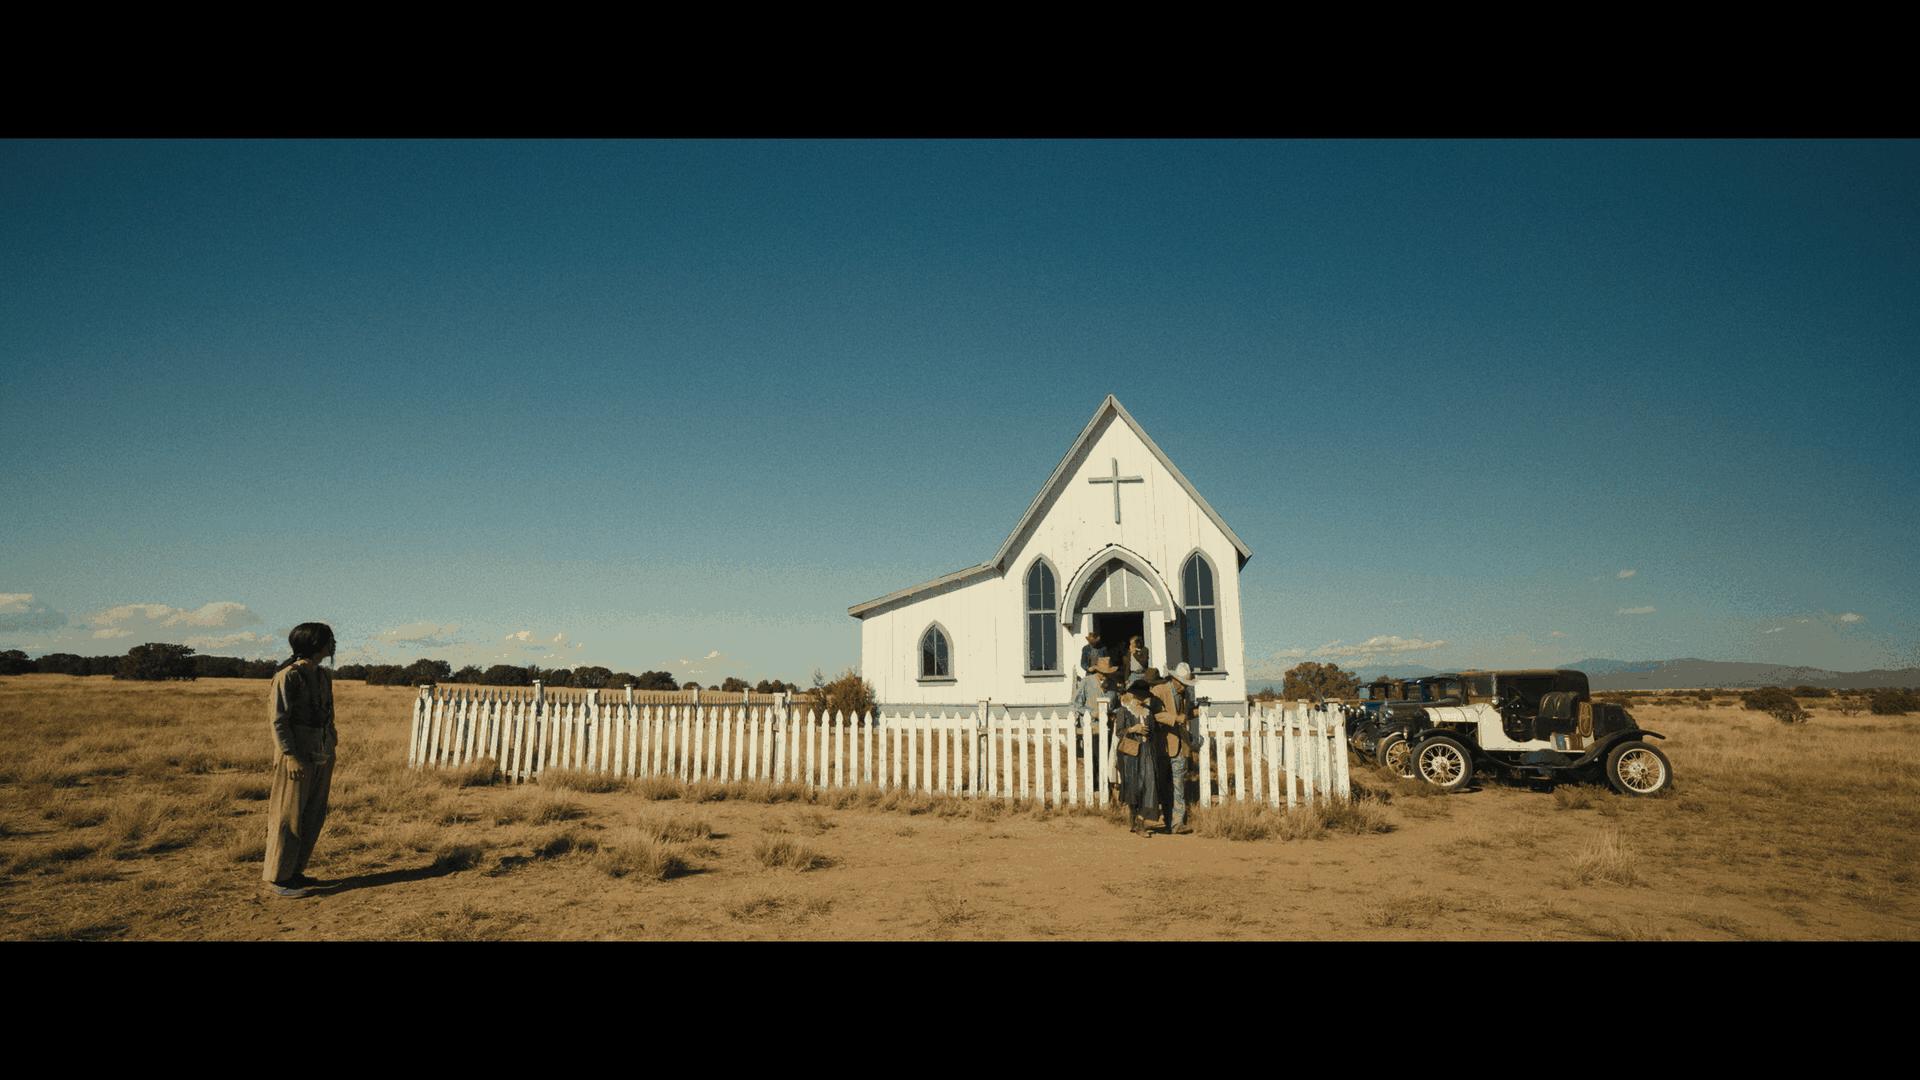 Dreamland (2019) [Merkin Fantasy Film Review] 3